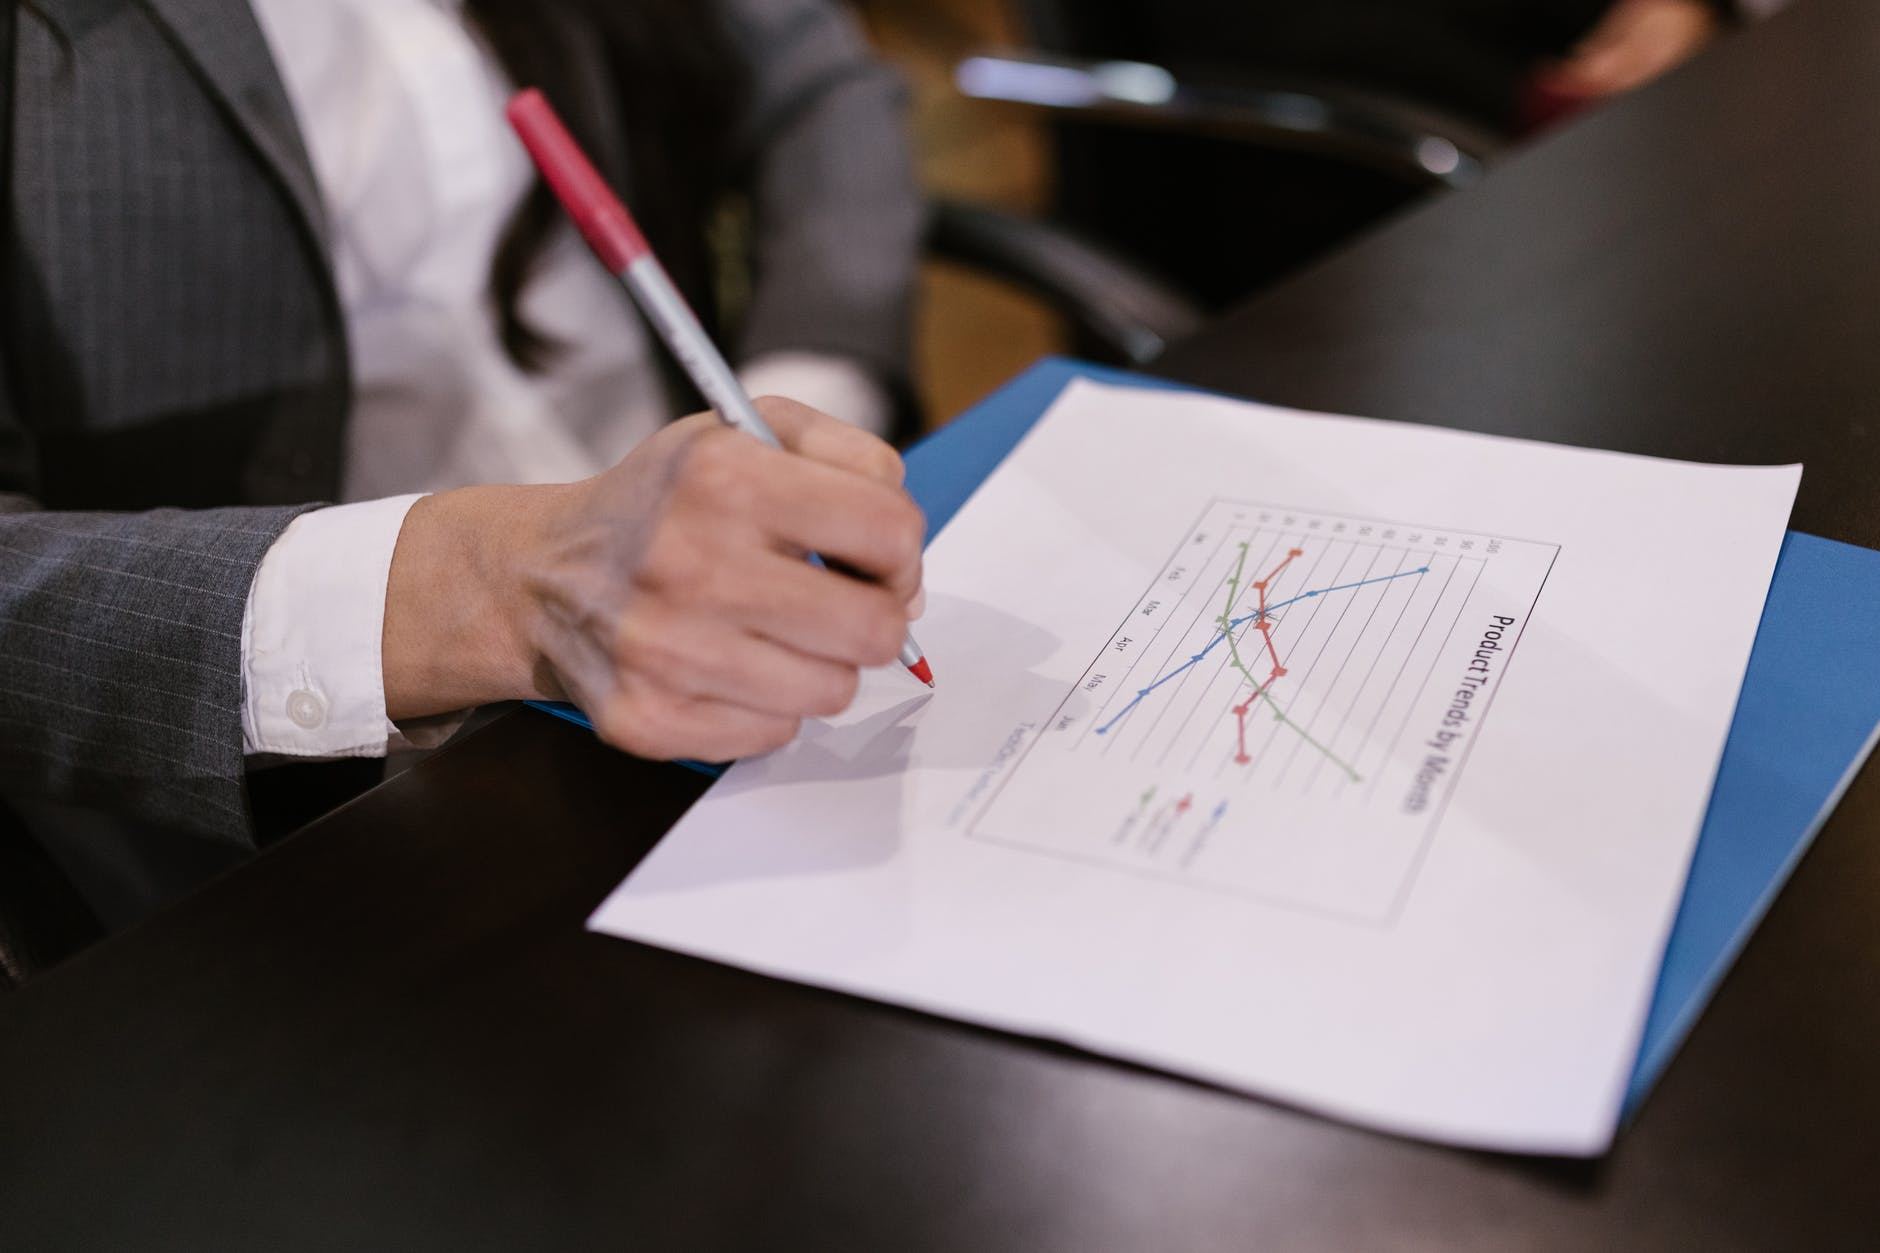 Ponto de equilíbrio financeiro: como e por que calcular